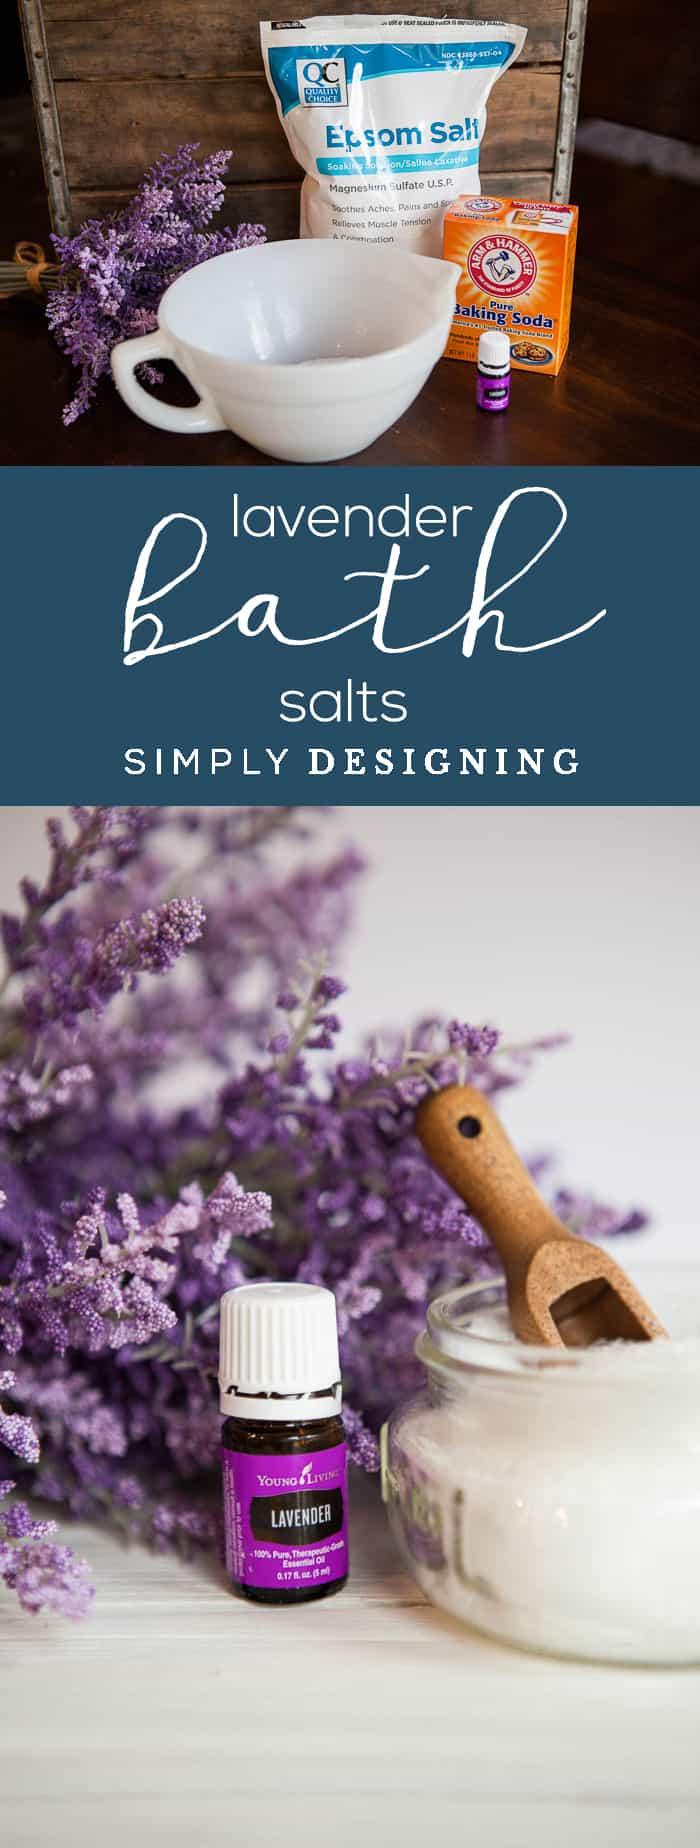 Lavender Bath Salts - this homemade bath salt recipe with 3 ingredients